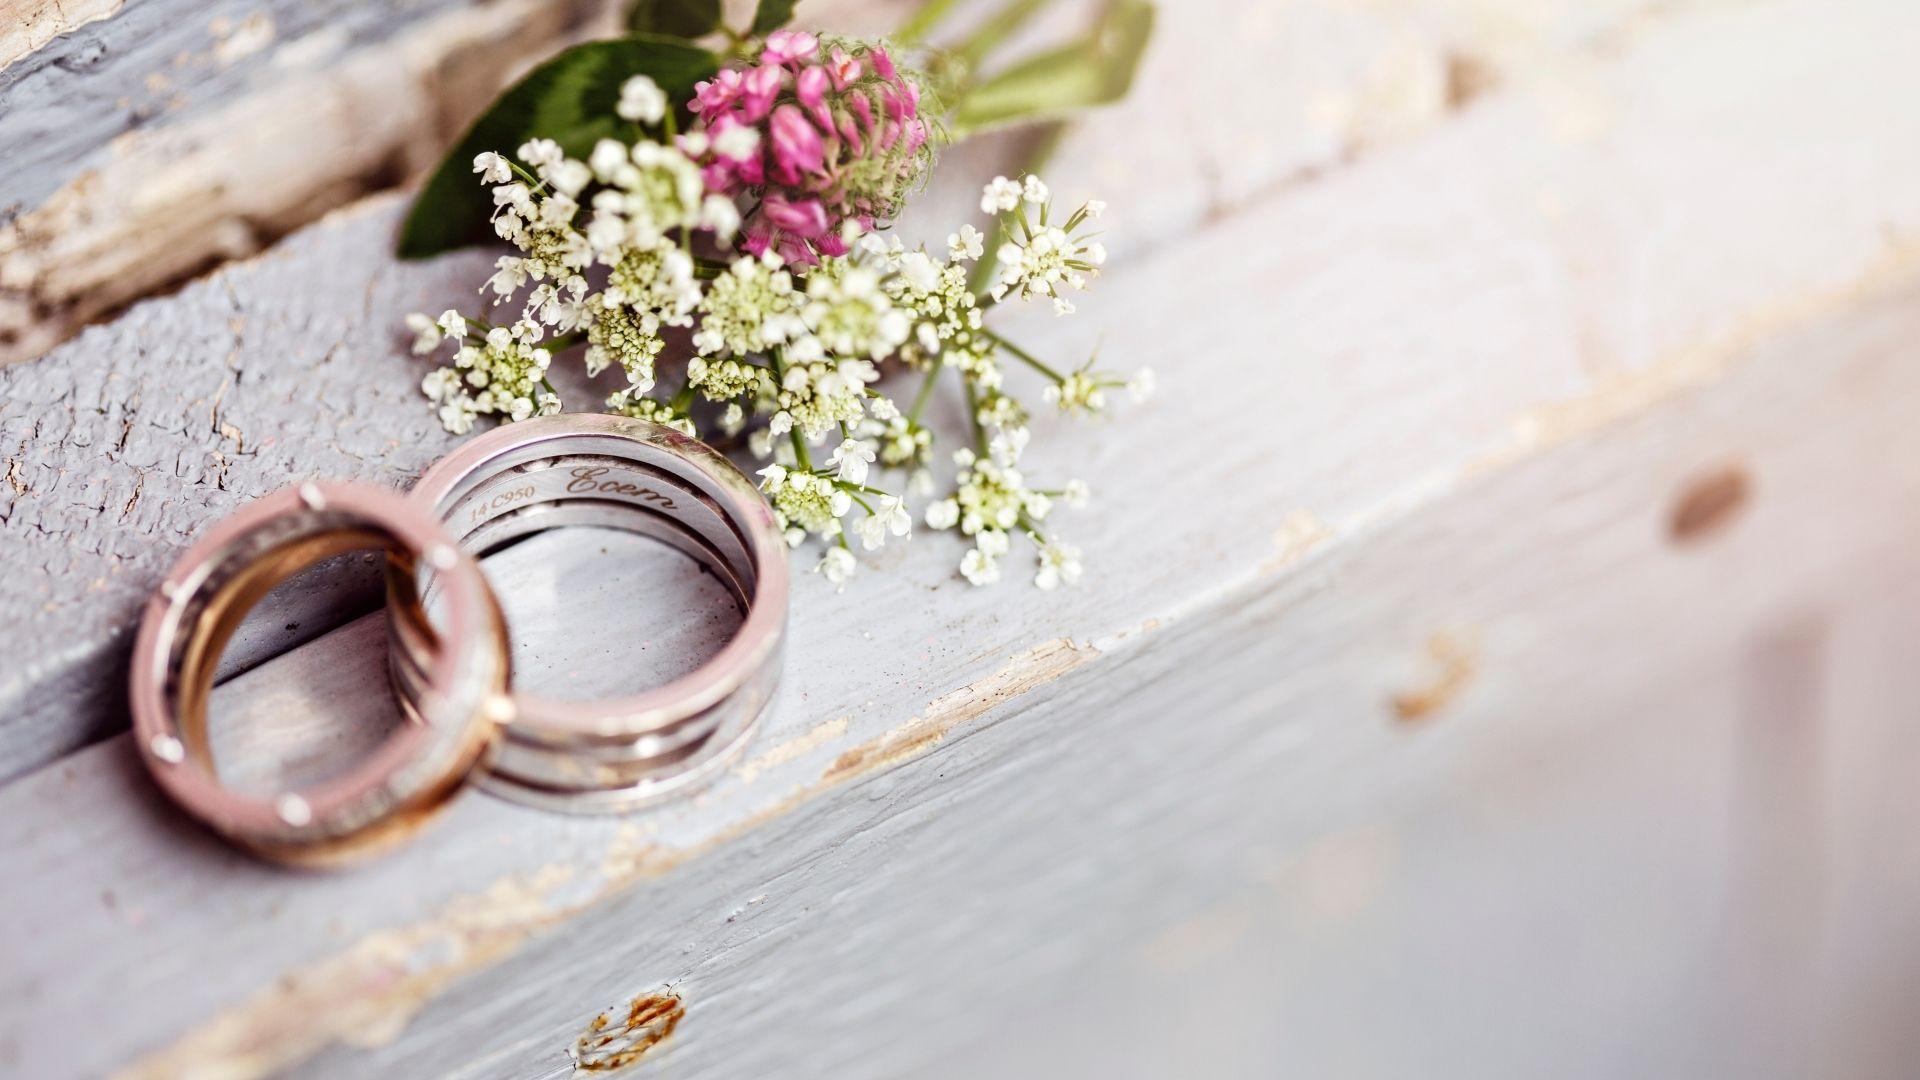 Weddings by Westy